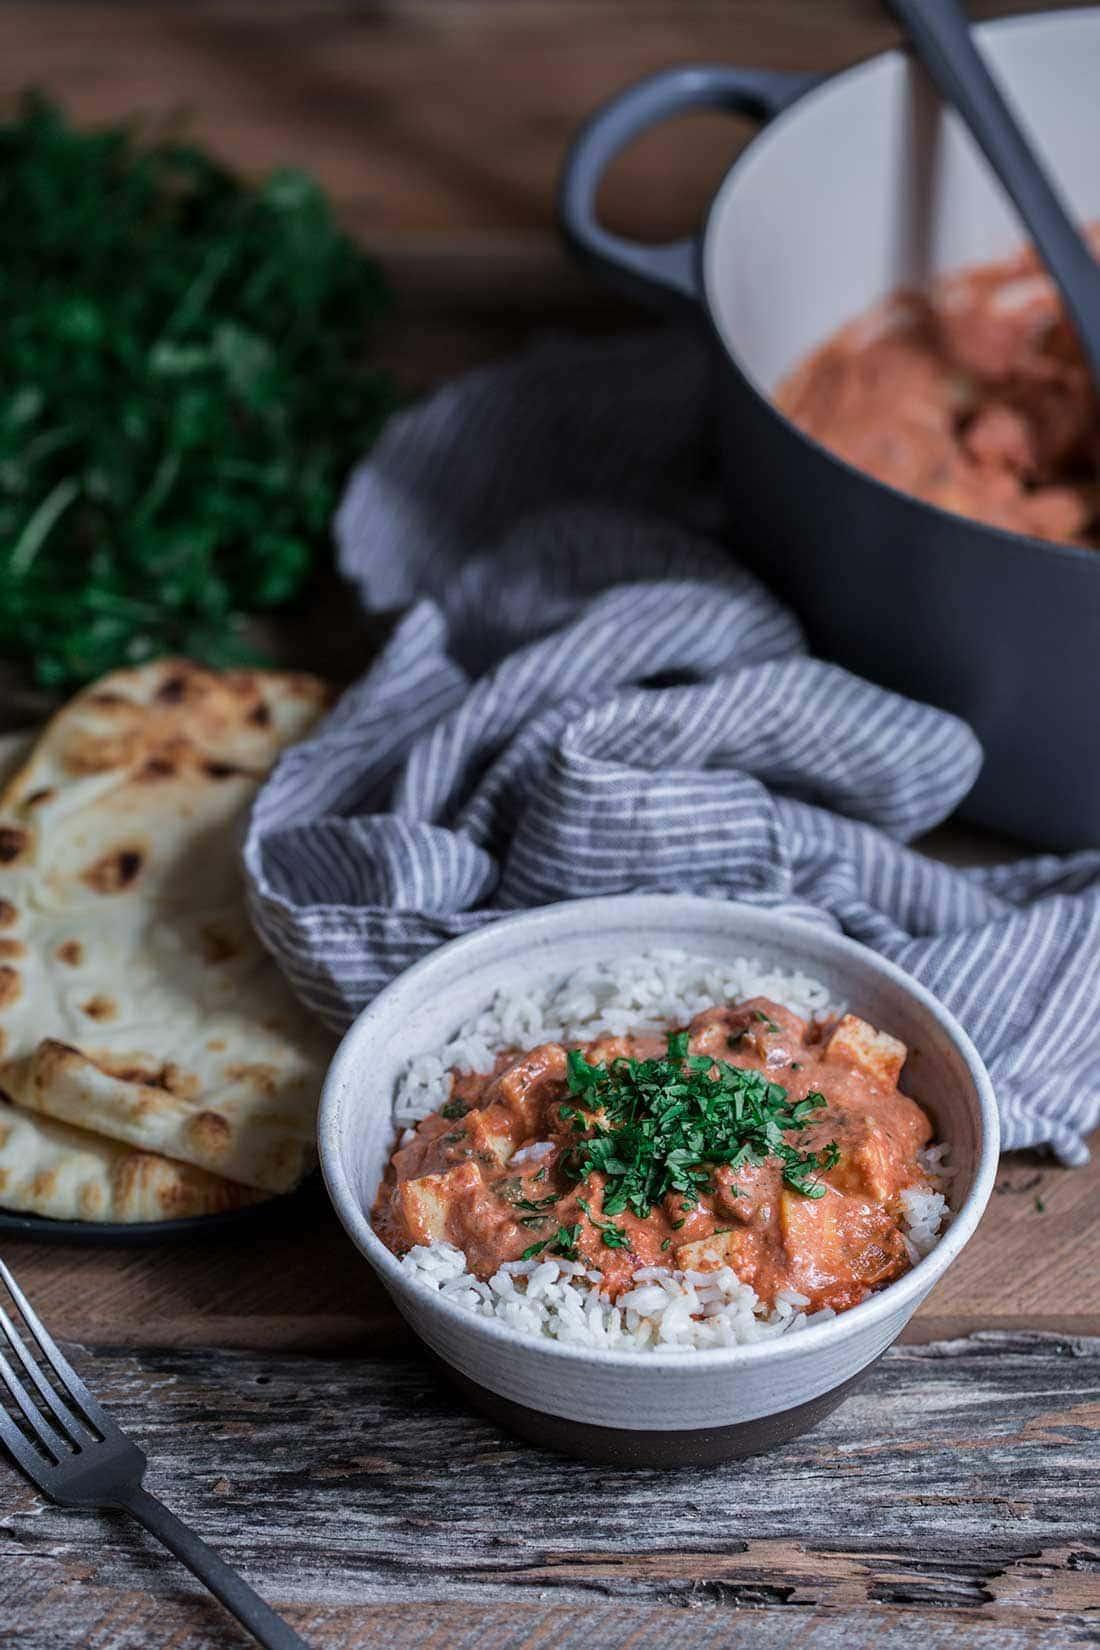 Paneer tikka masala recipe in a bowl